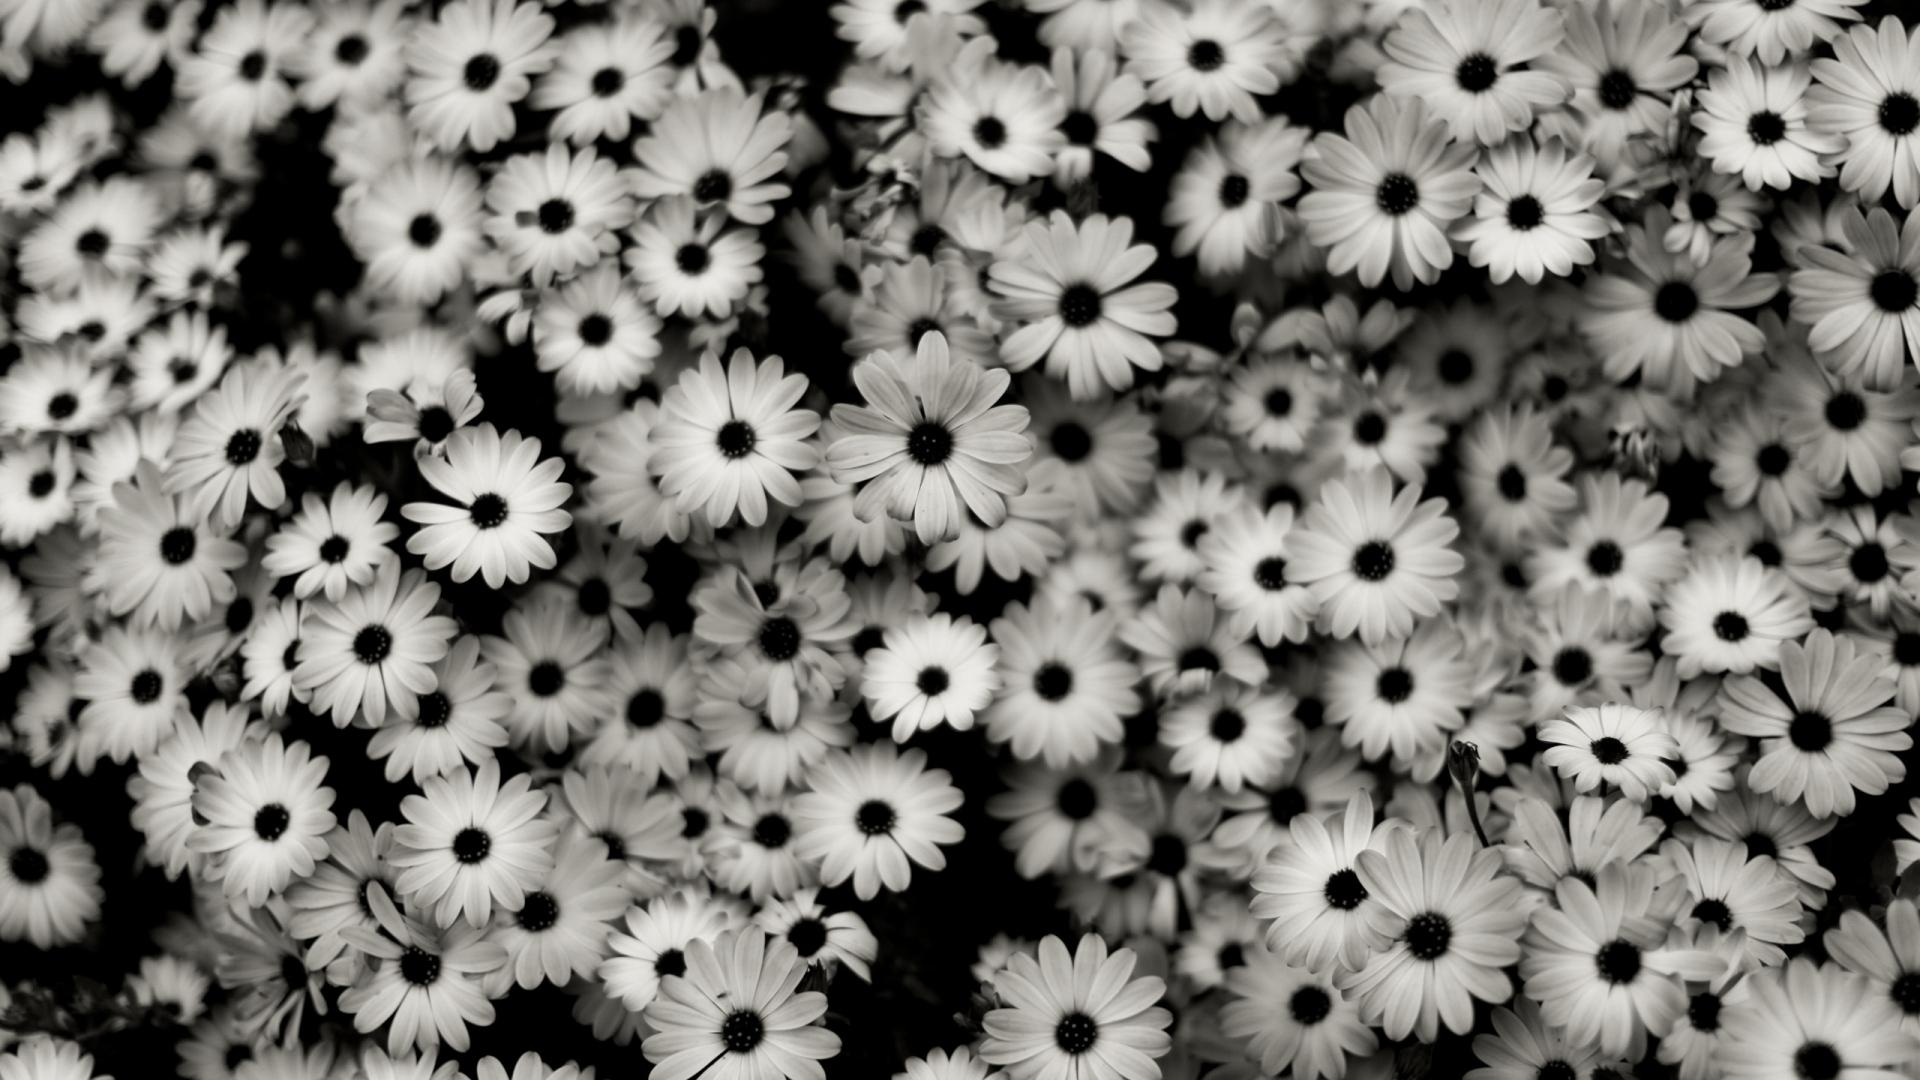 Full HD 1080p Flowers Wallpapers, Desktop Backgrounds HD Downloads